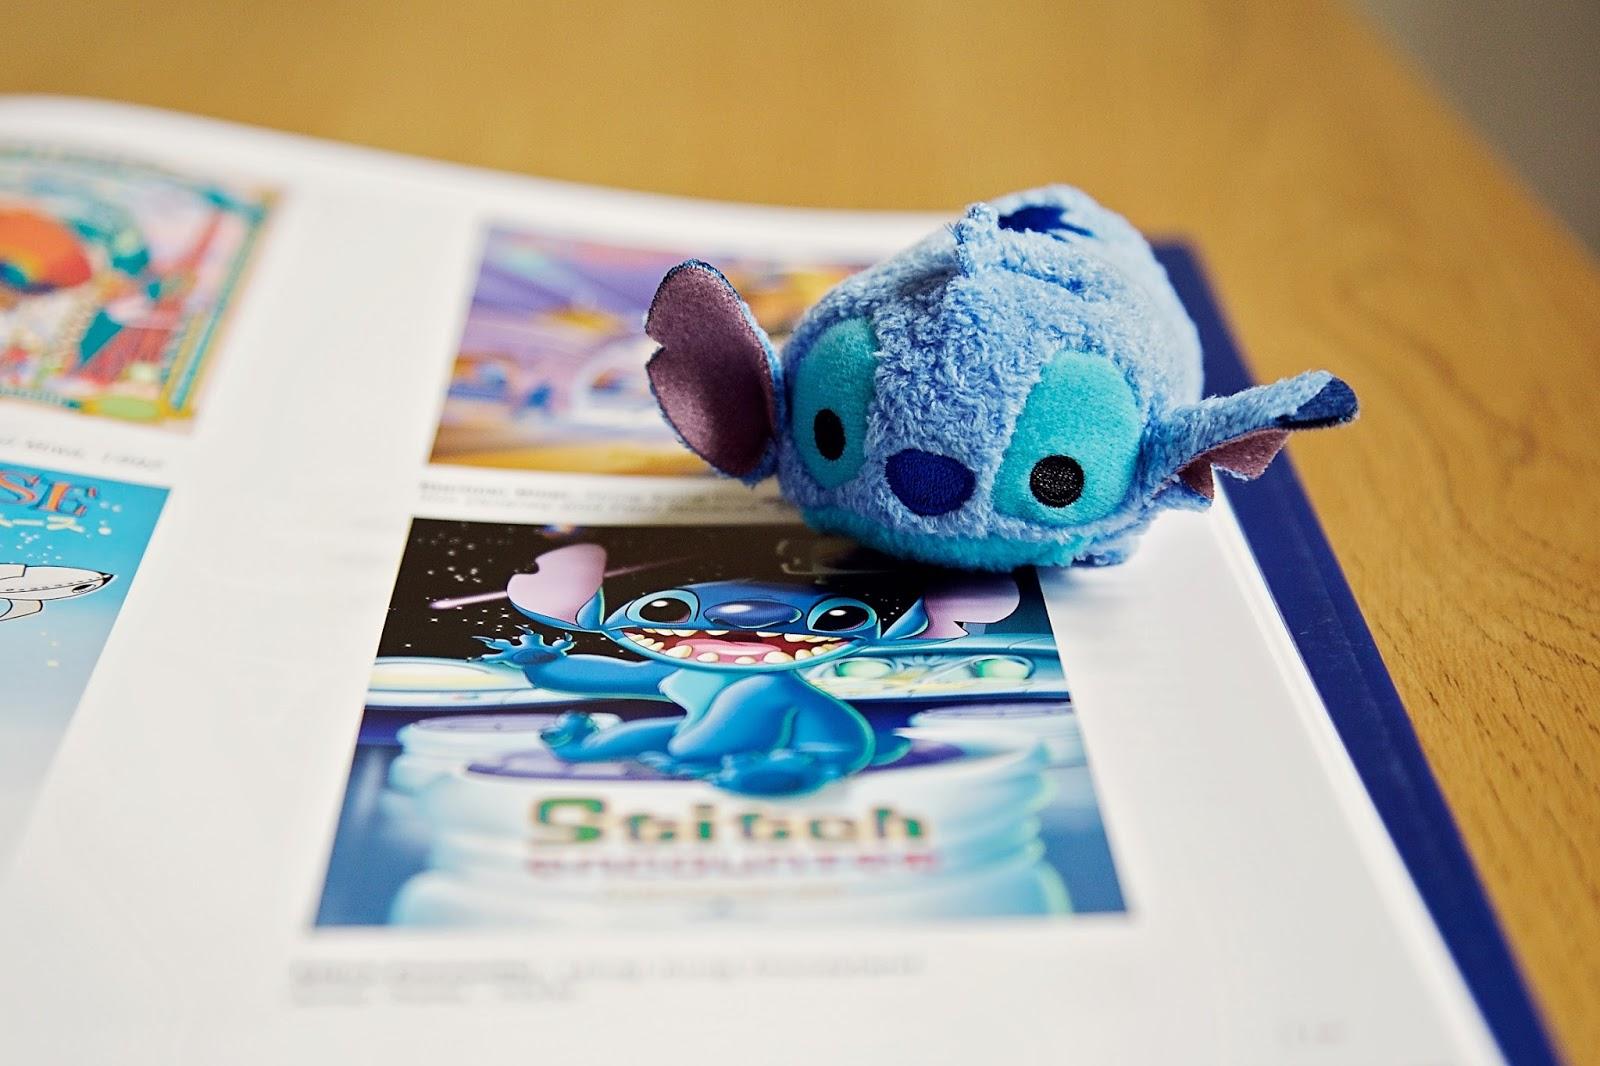 Disney Stitch Tsum Tsum on top of Stitch image.